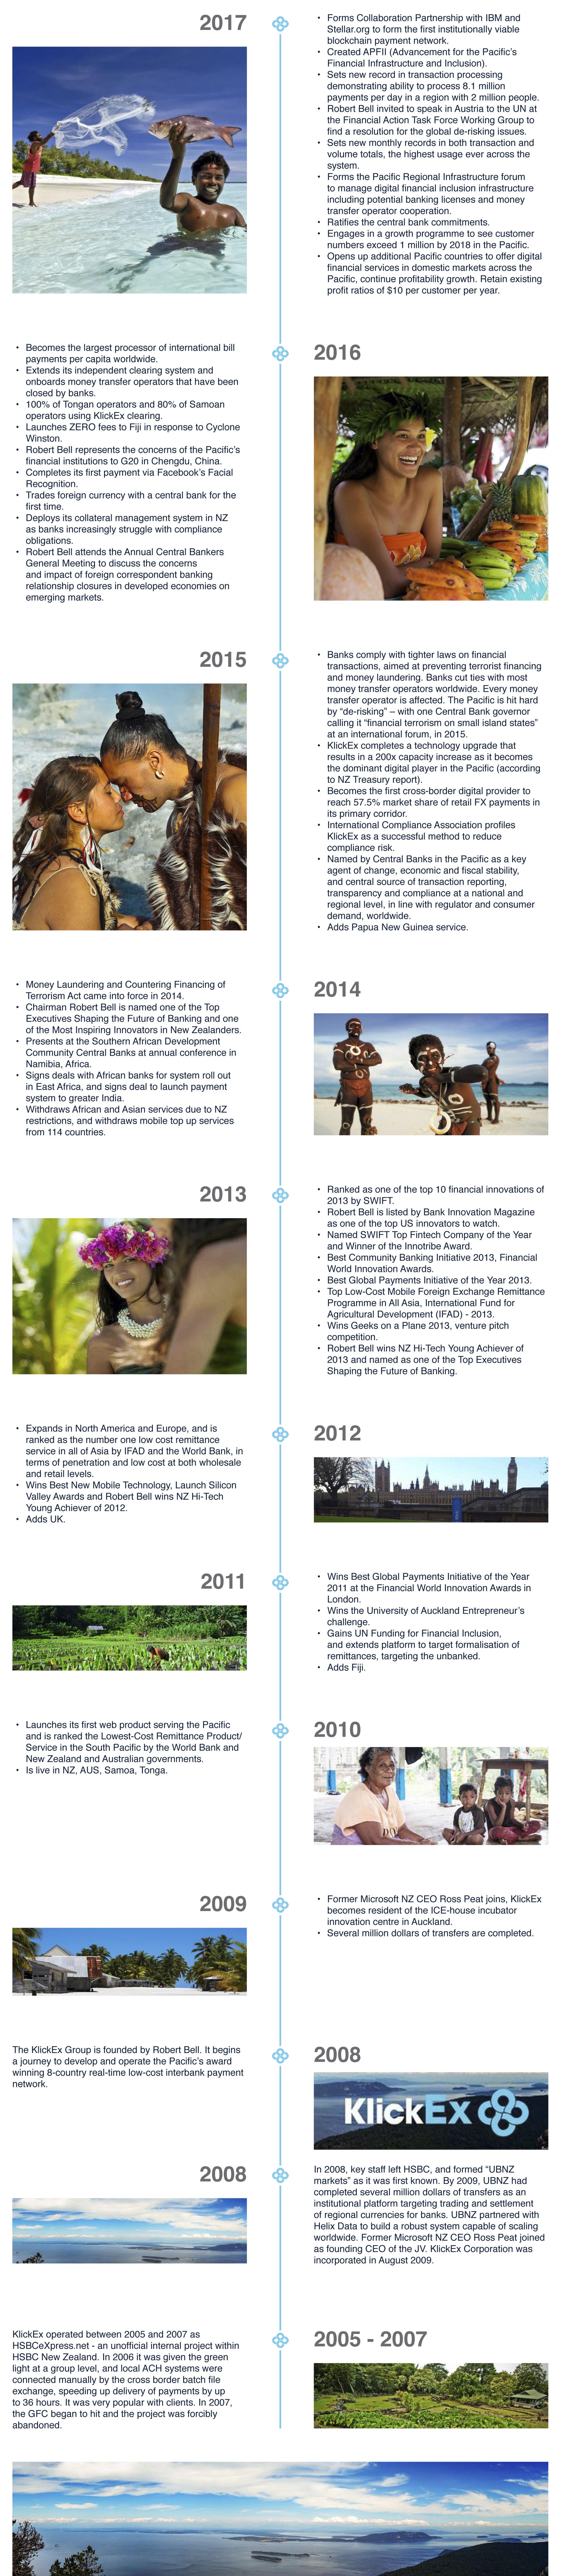 KlickEx Timeline image for website updated Oct17websize.jpg